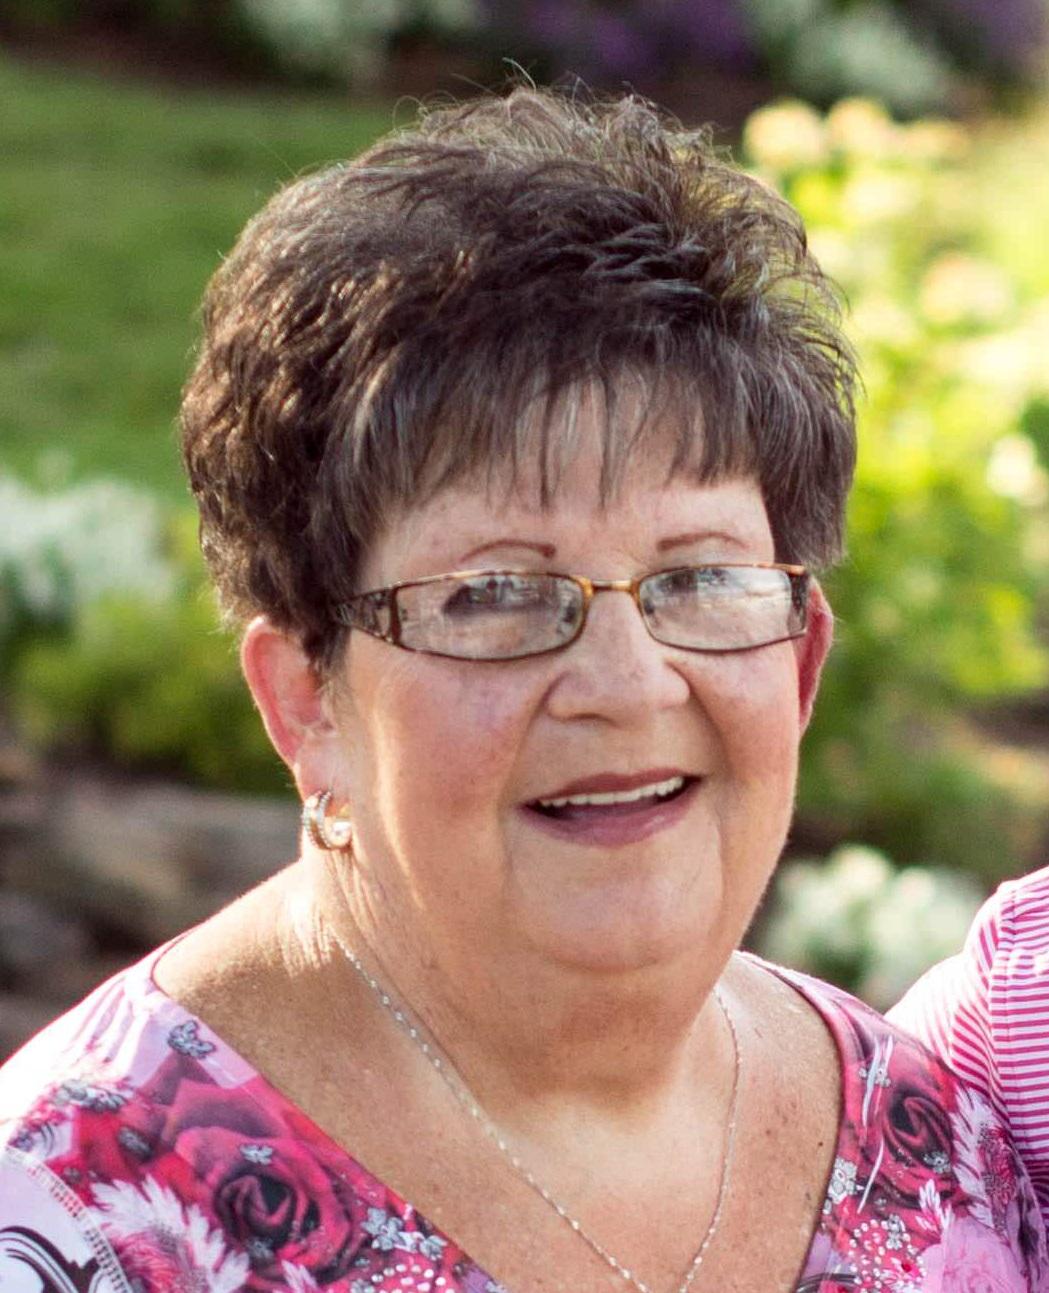 Rita M. Egler, age 75 of Jasper